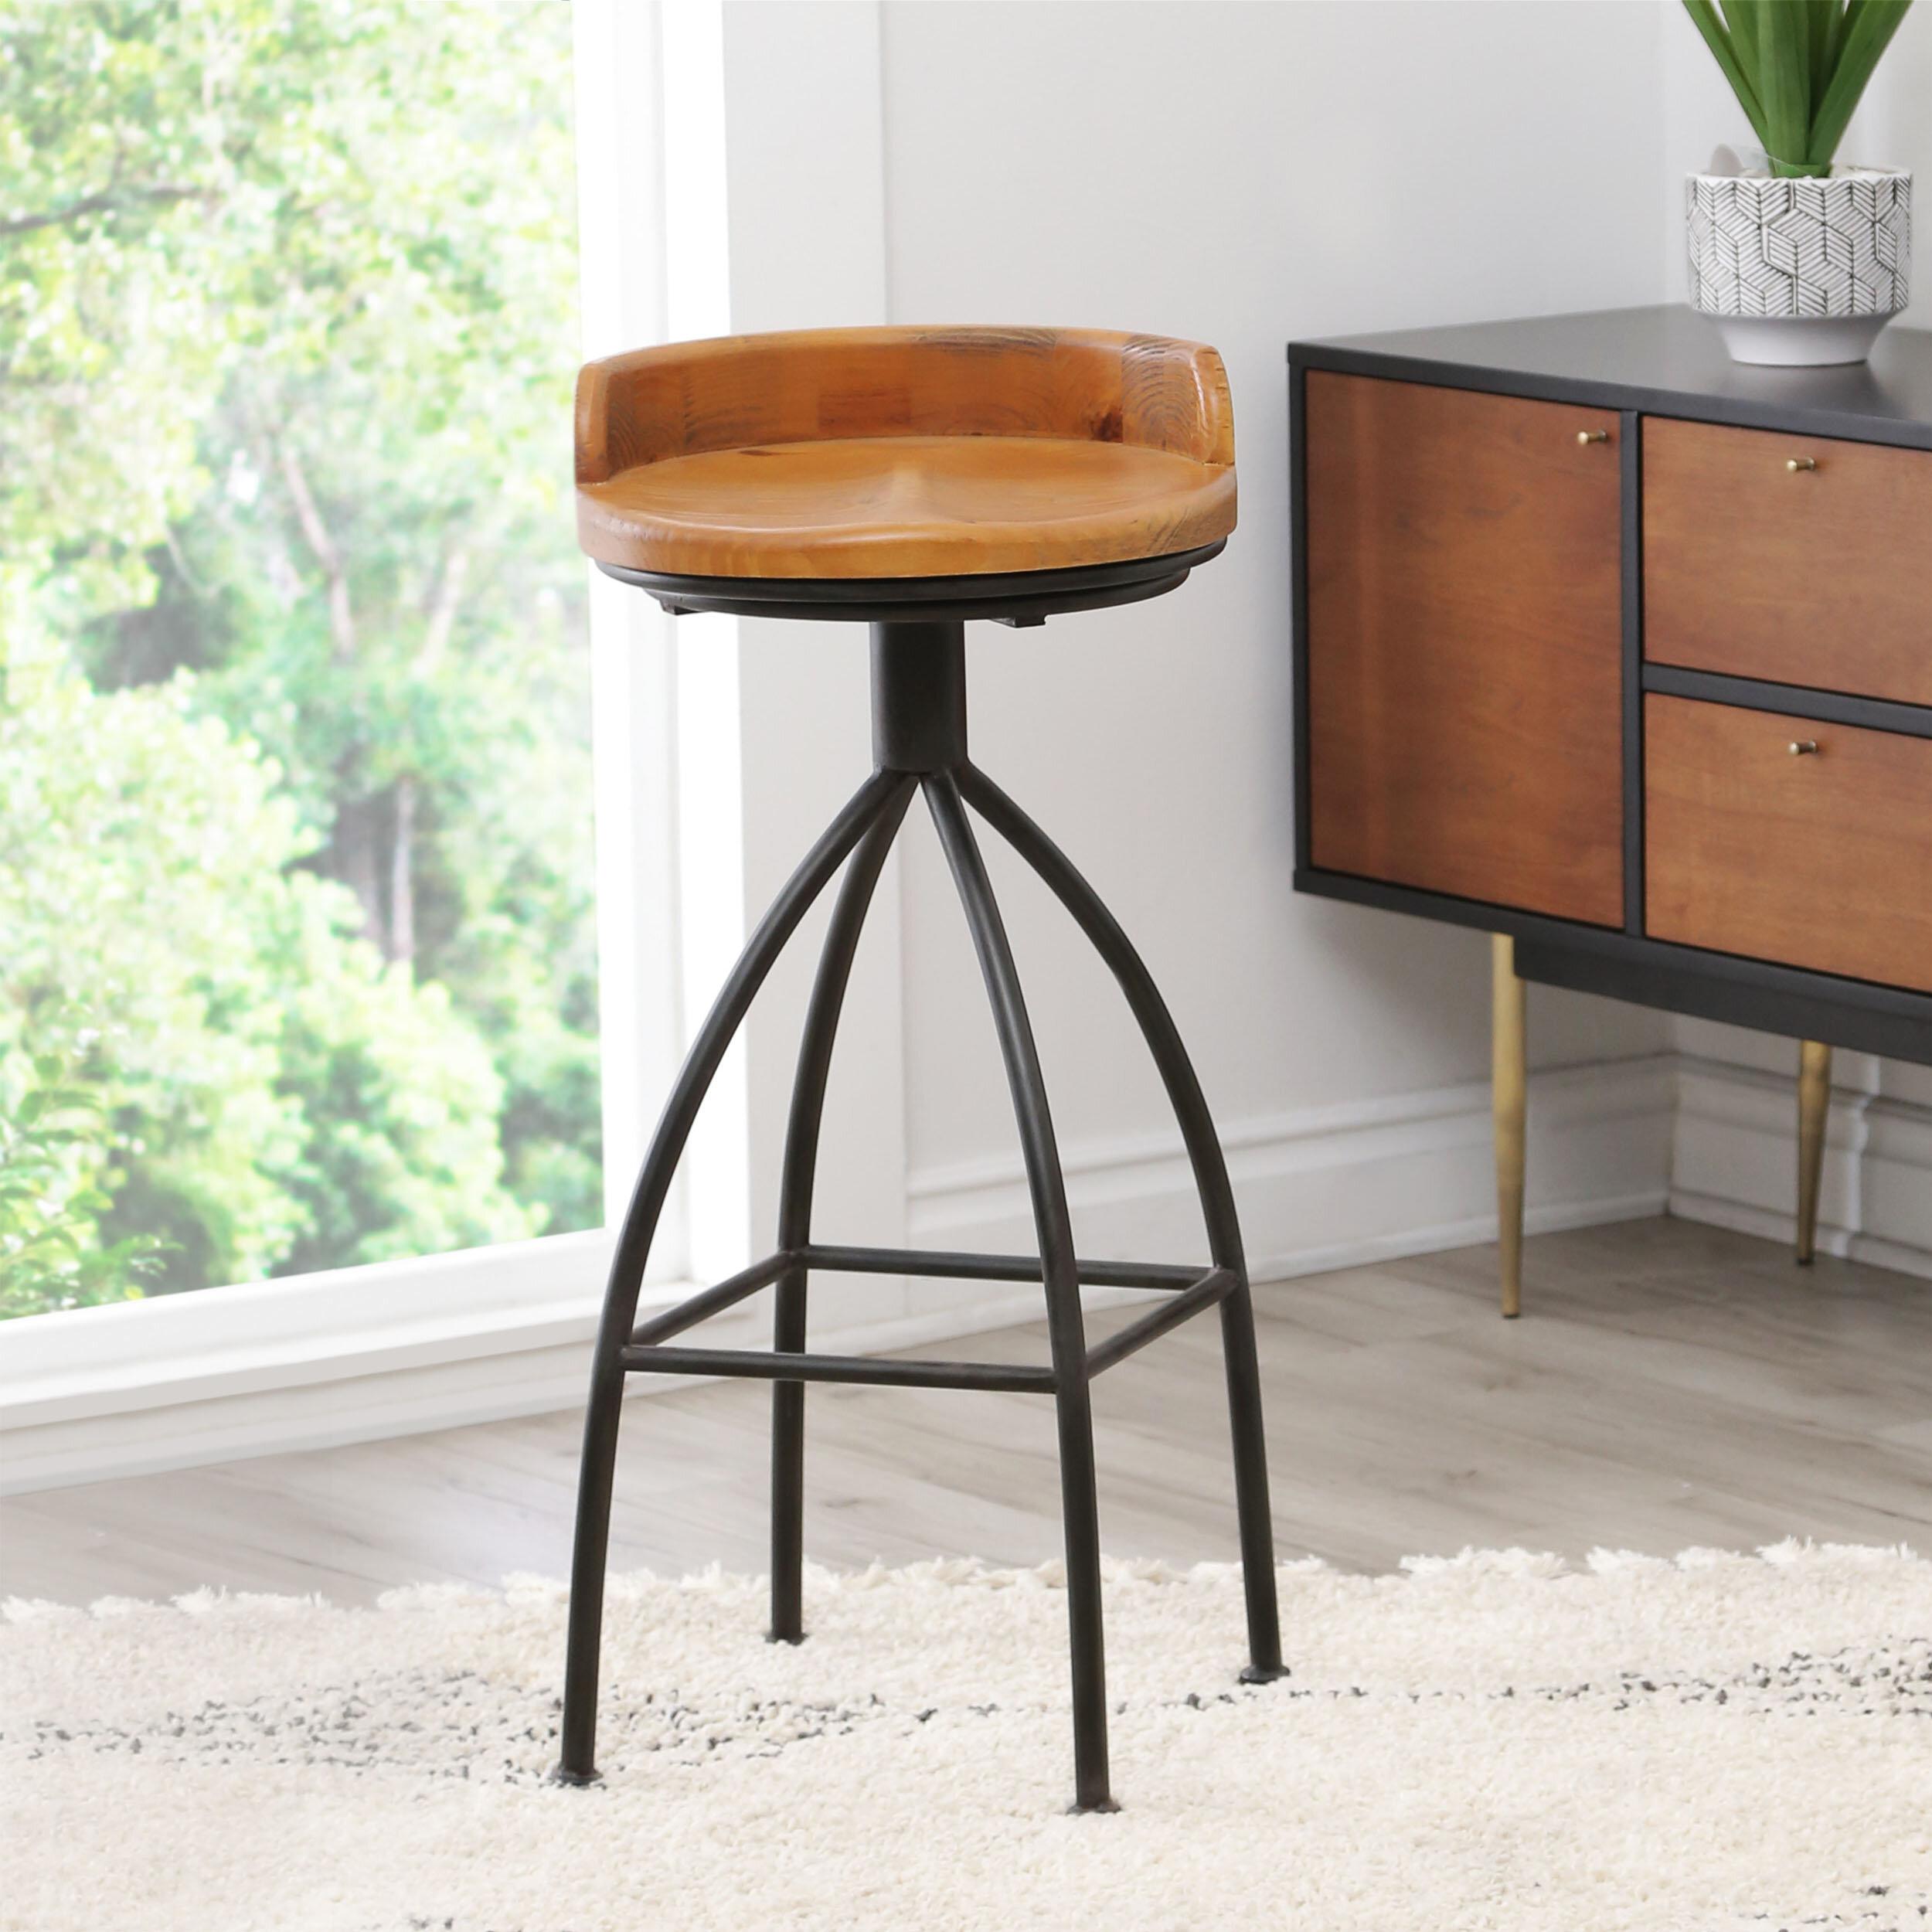 Stupendous Roussillon Industrial 30 Swivel Bar Stool Ibusinesslaw Wood Chair Design Ideas Ibusinesslaworg